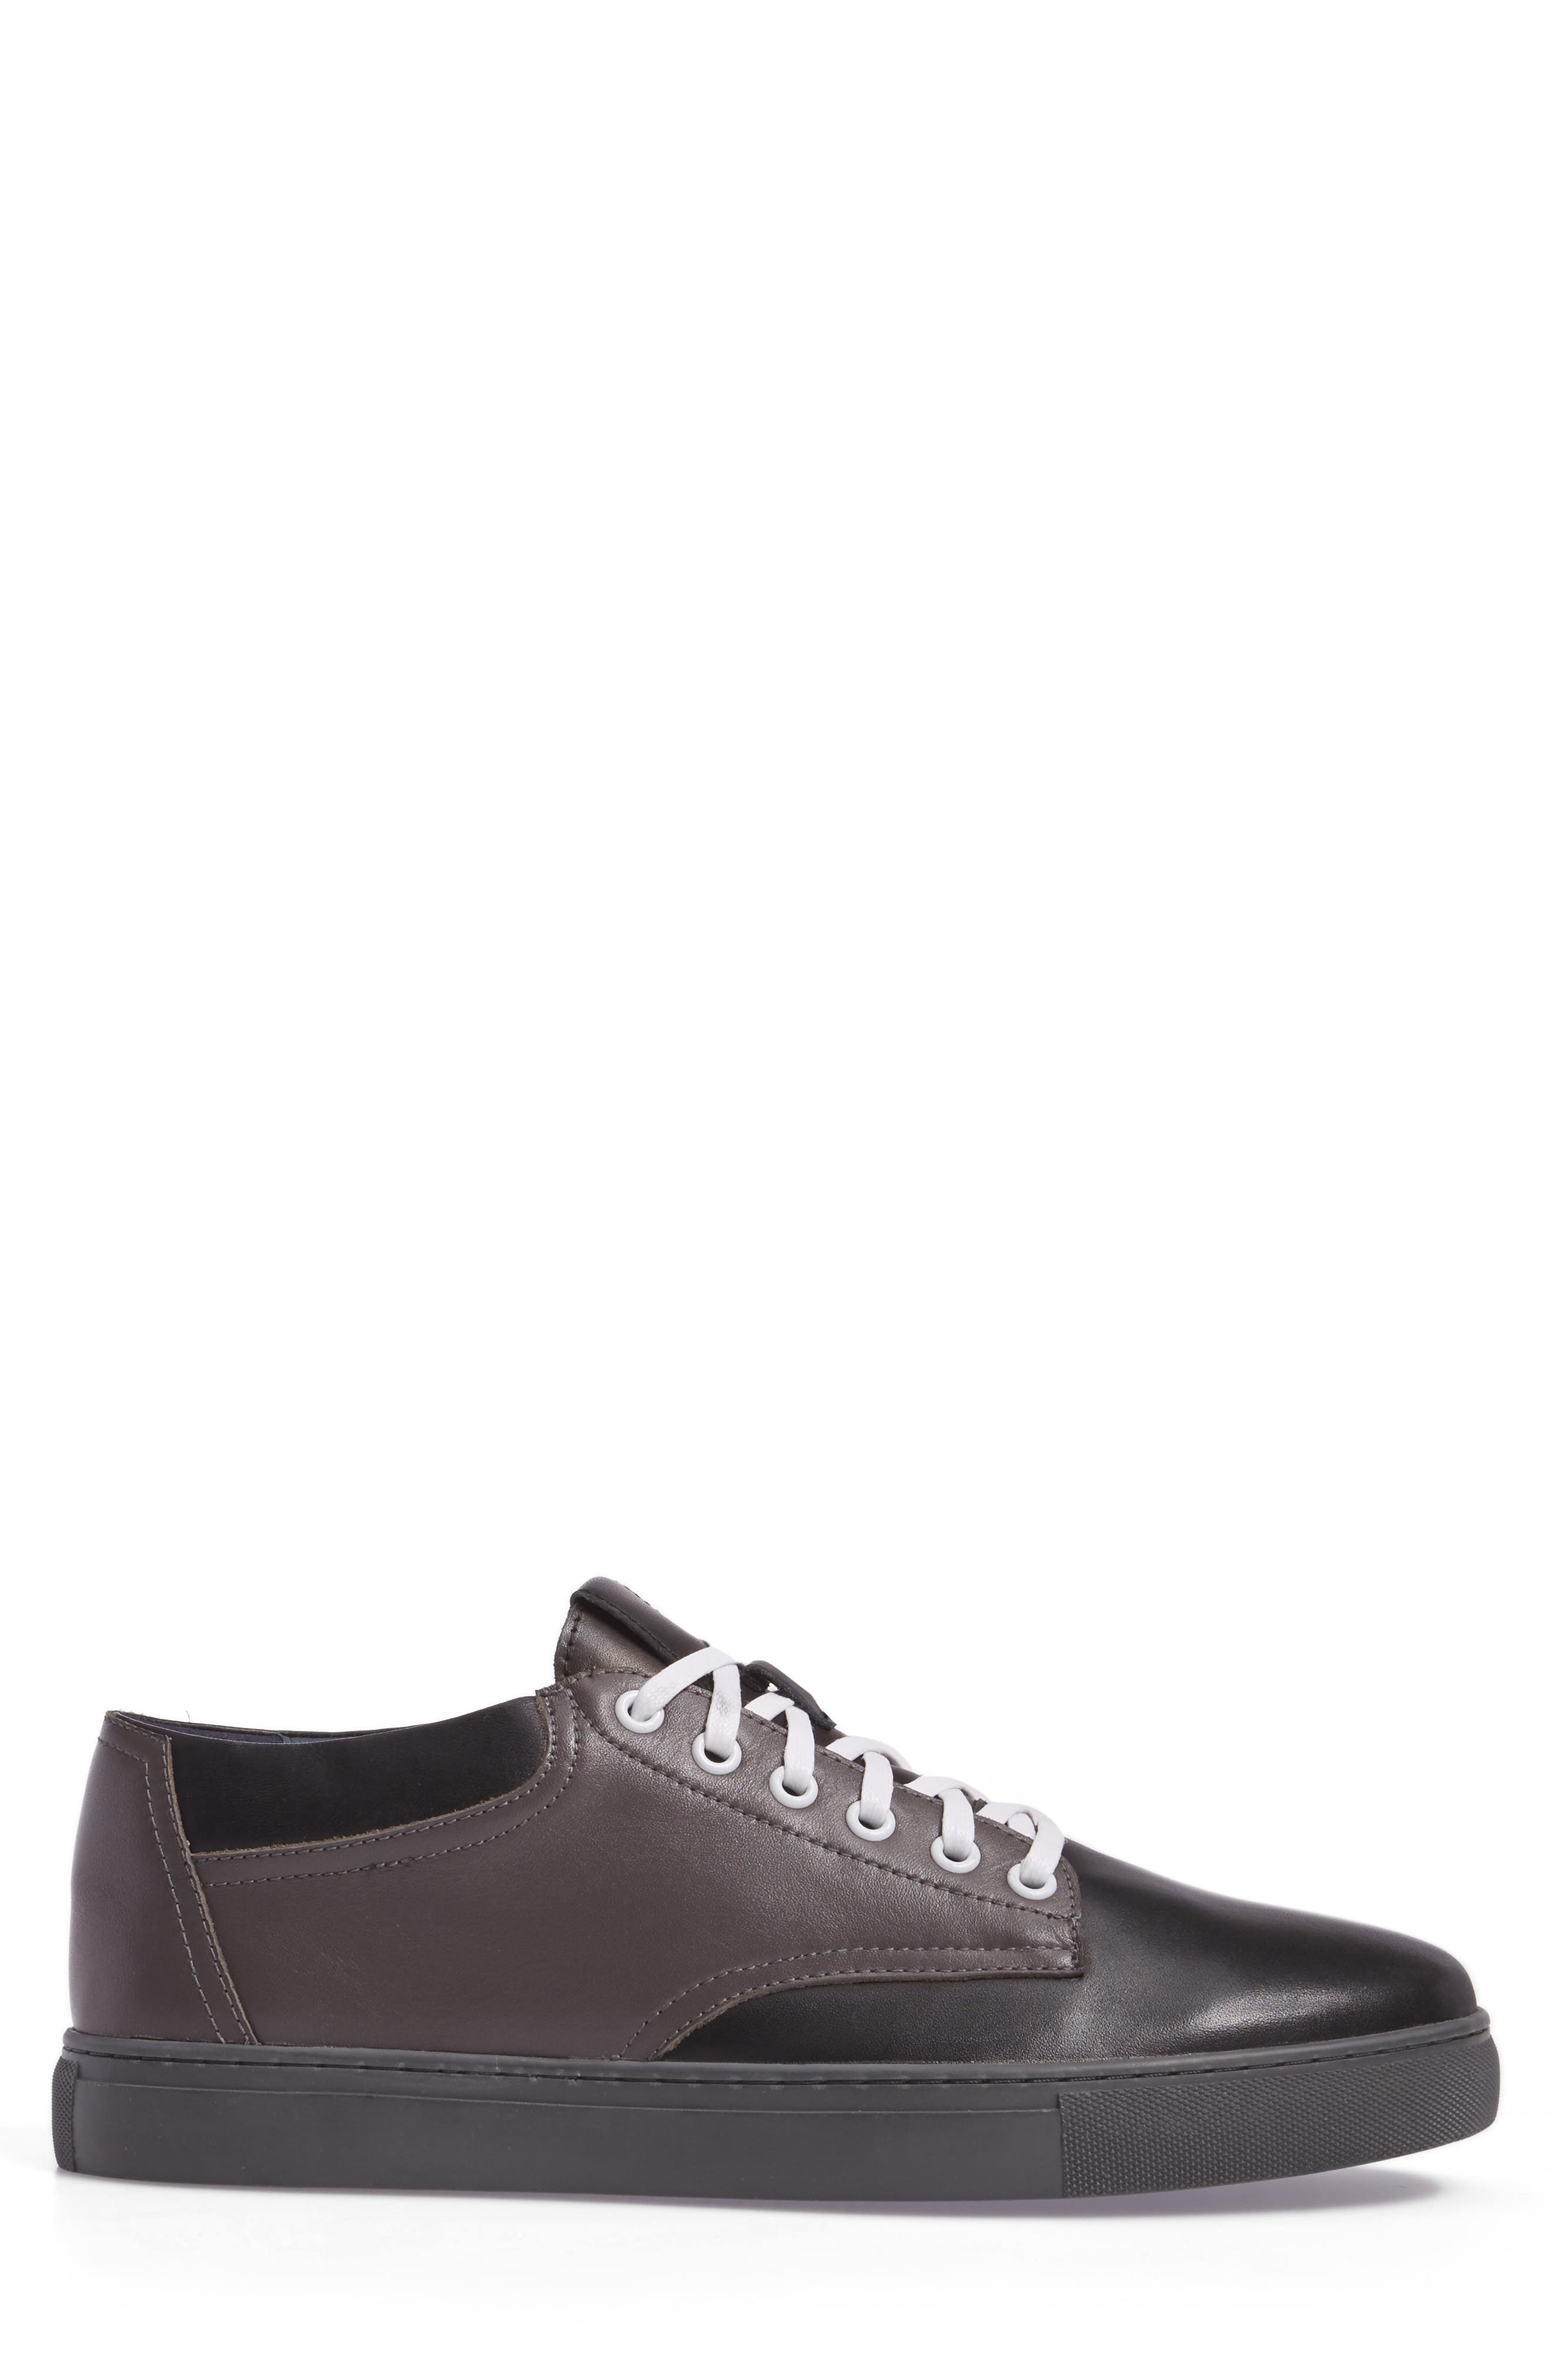 Alternate Image 3  - Zanzara Ralston Sneaker (Men)